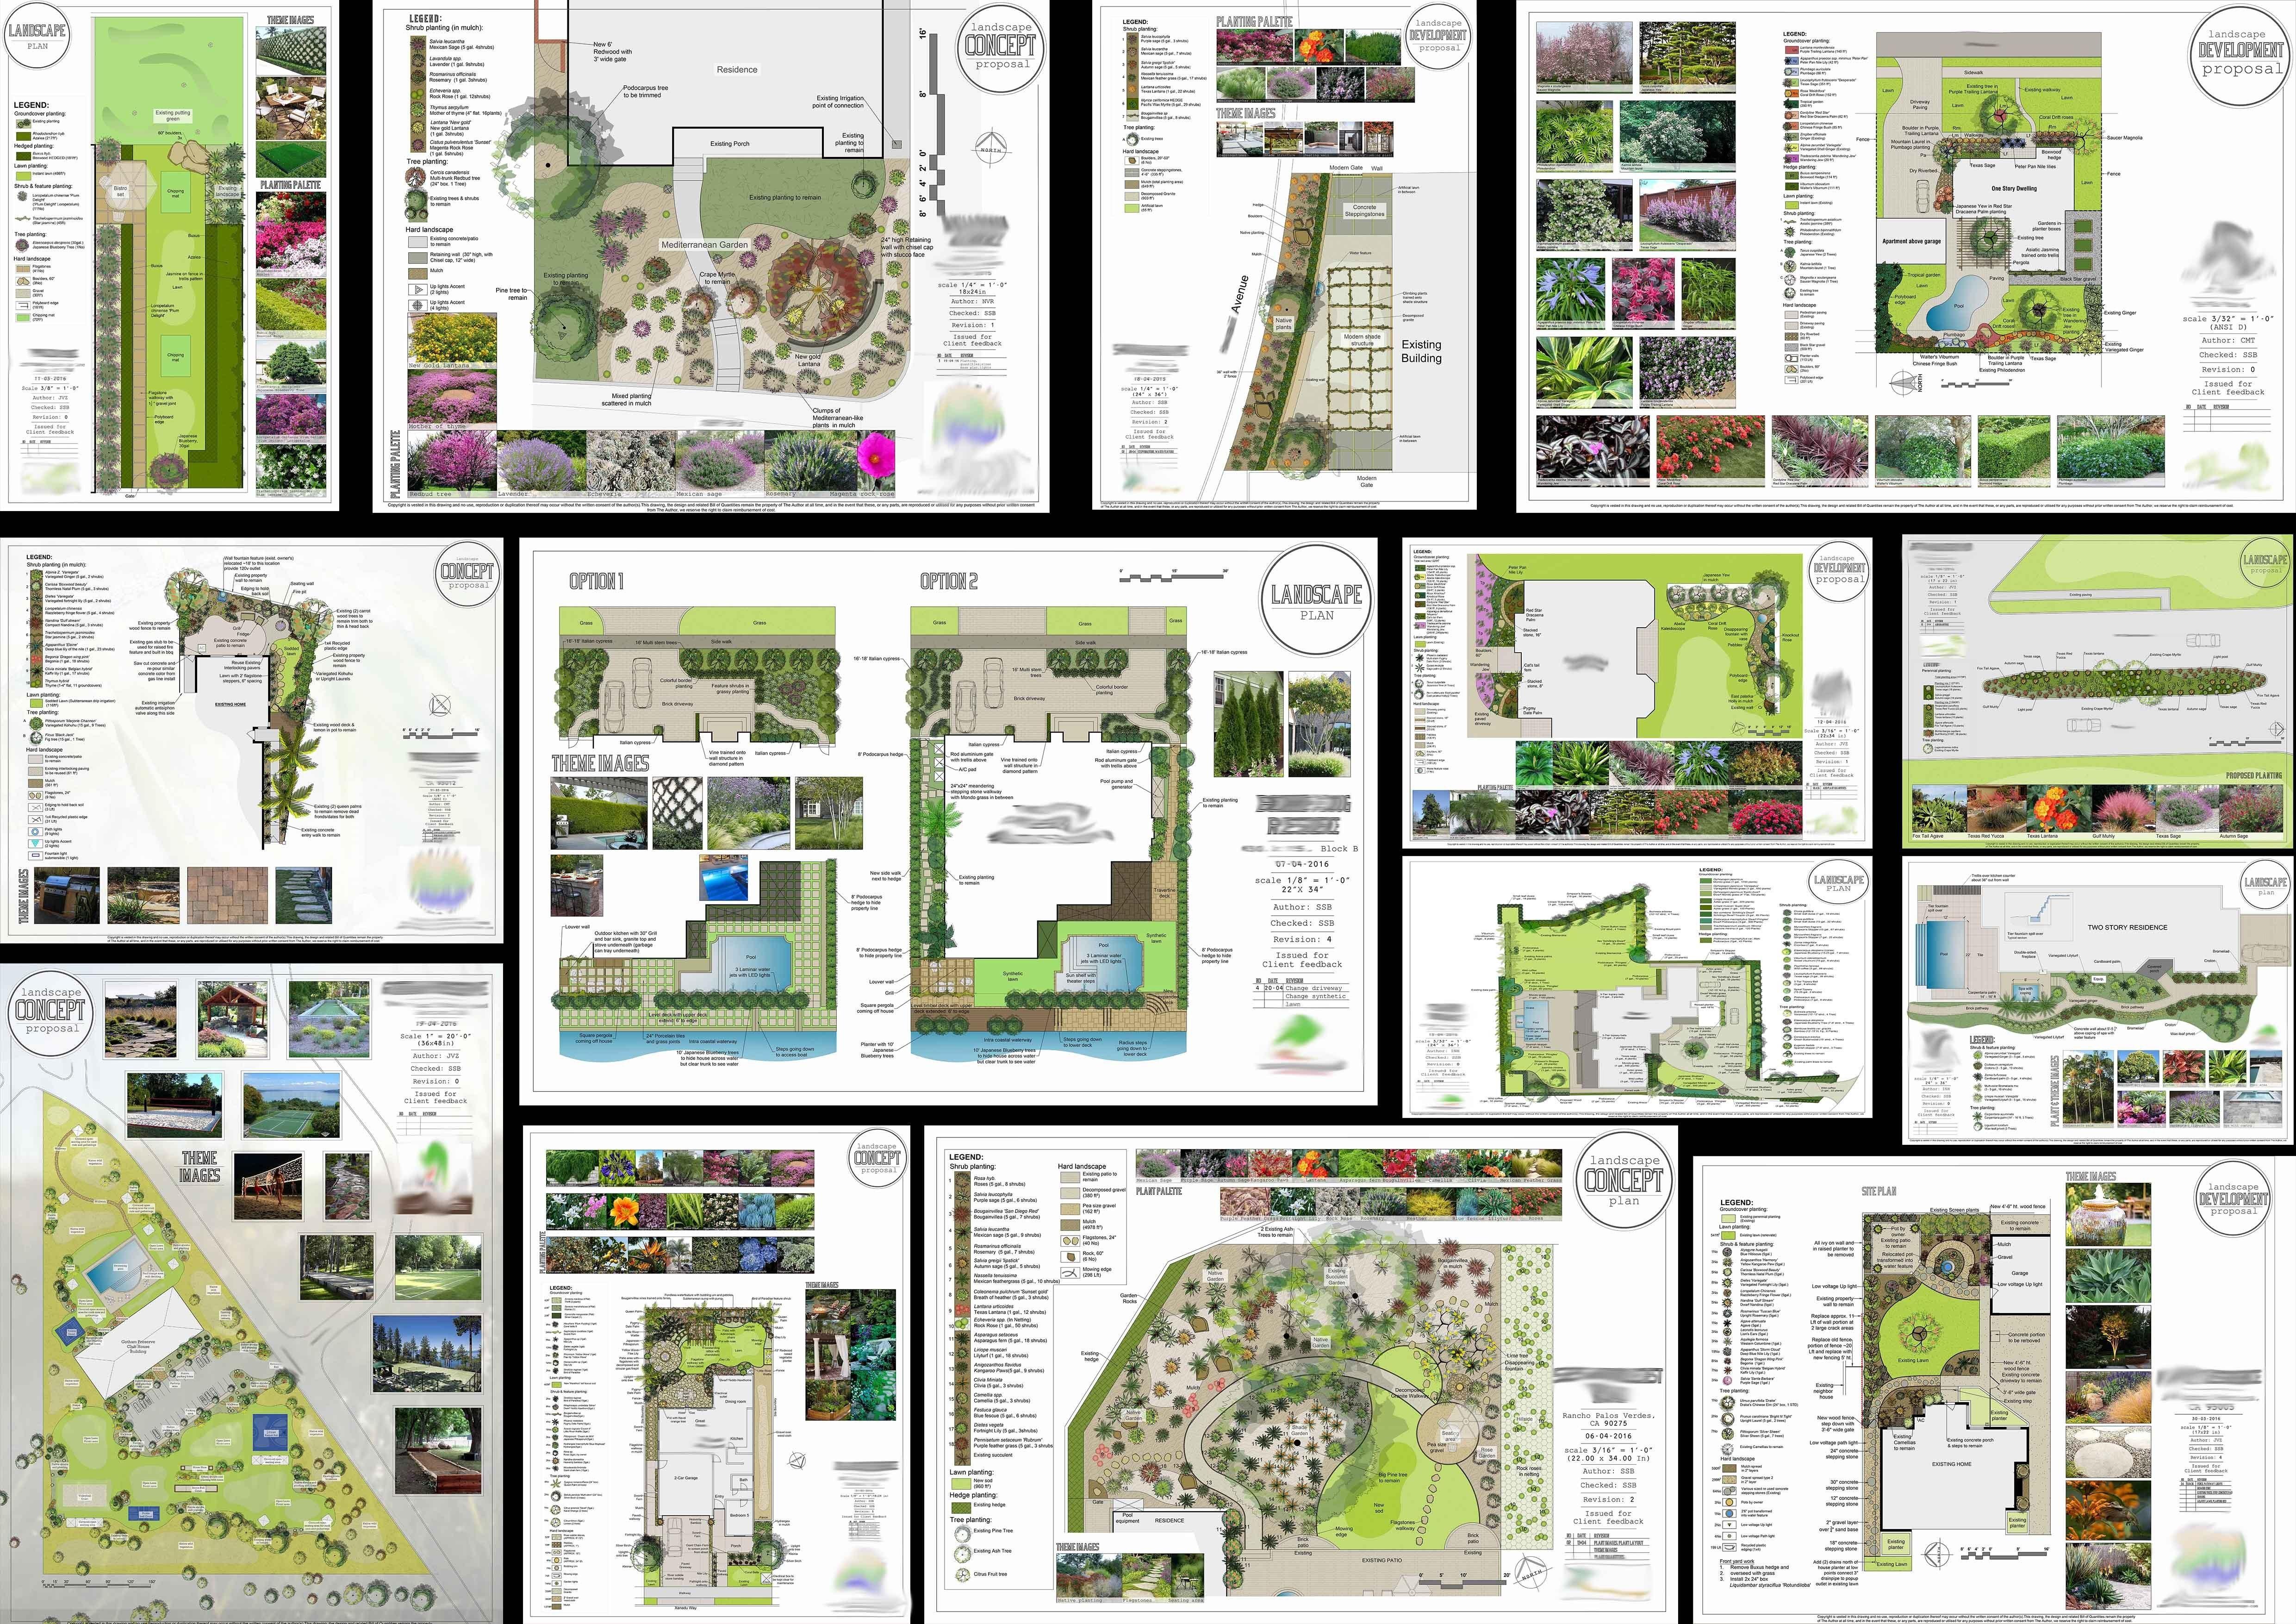 Residential Landscape Design Concepts Landscape Design Concept